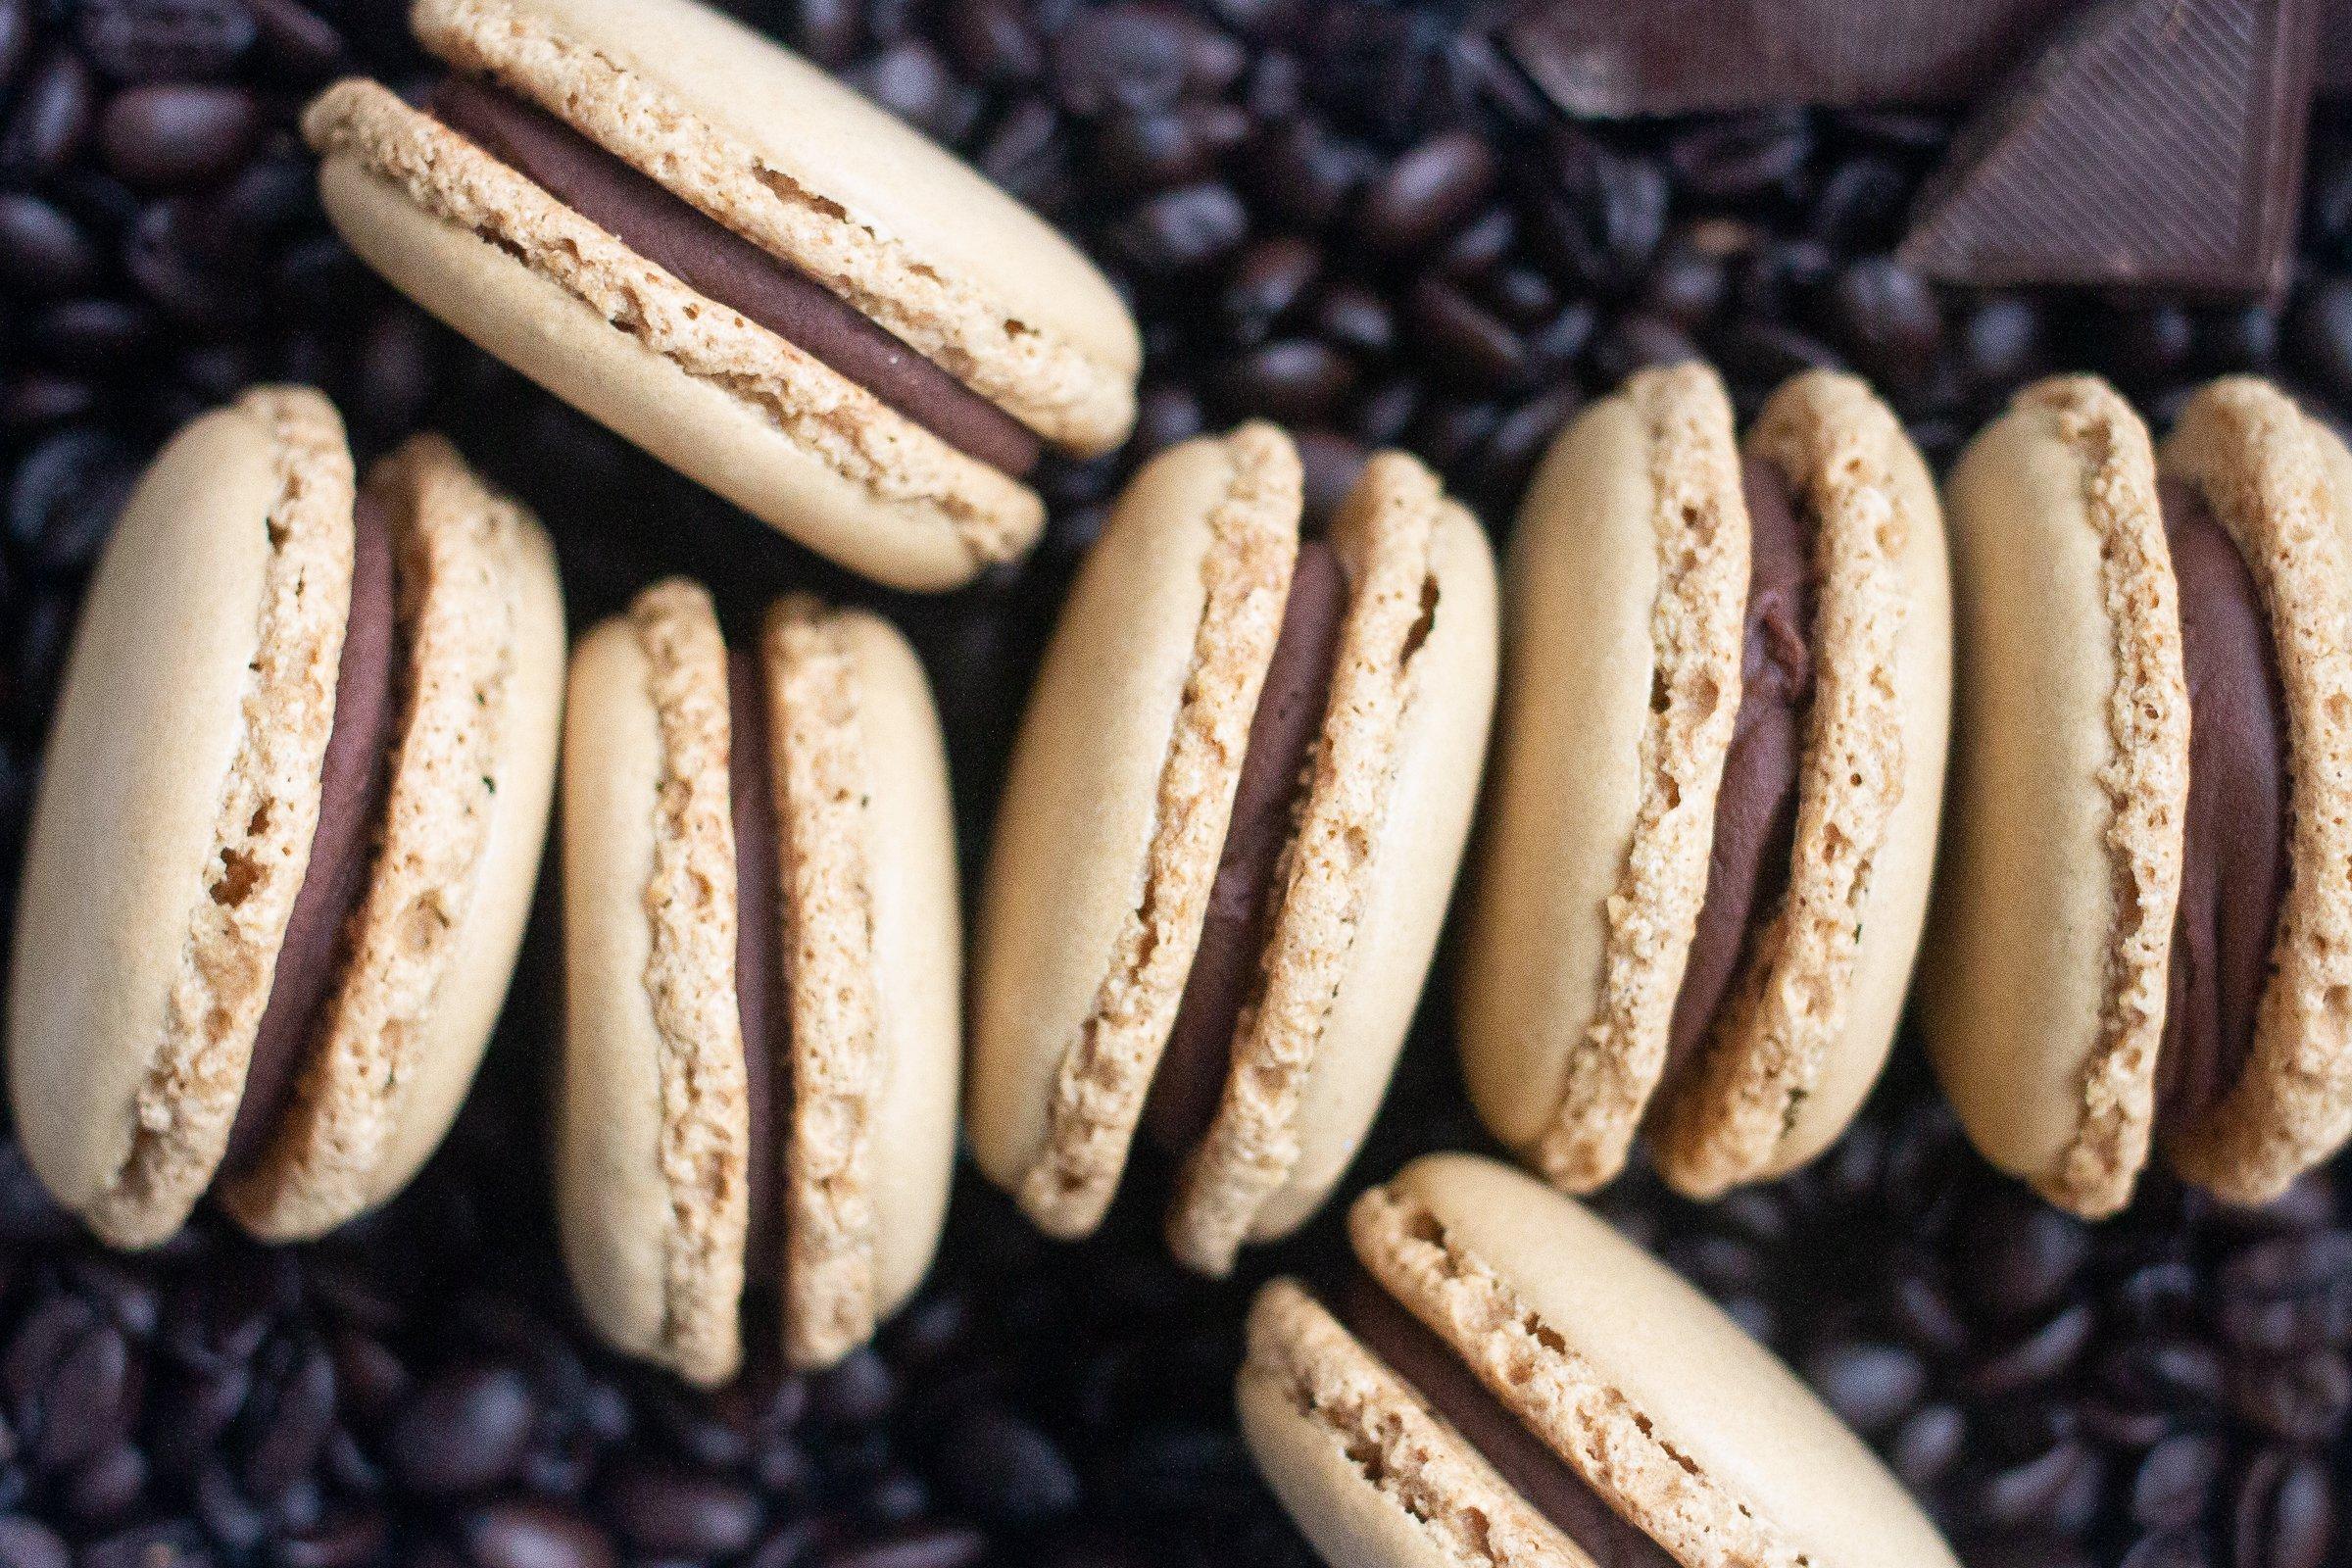 Mocha macarons on coffee beans